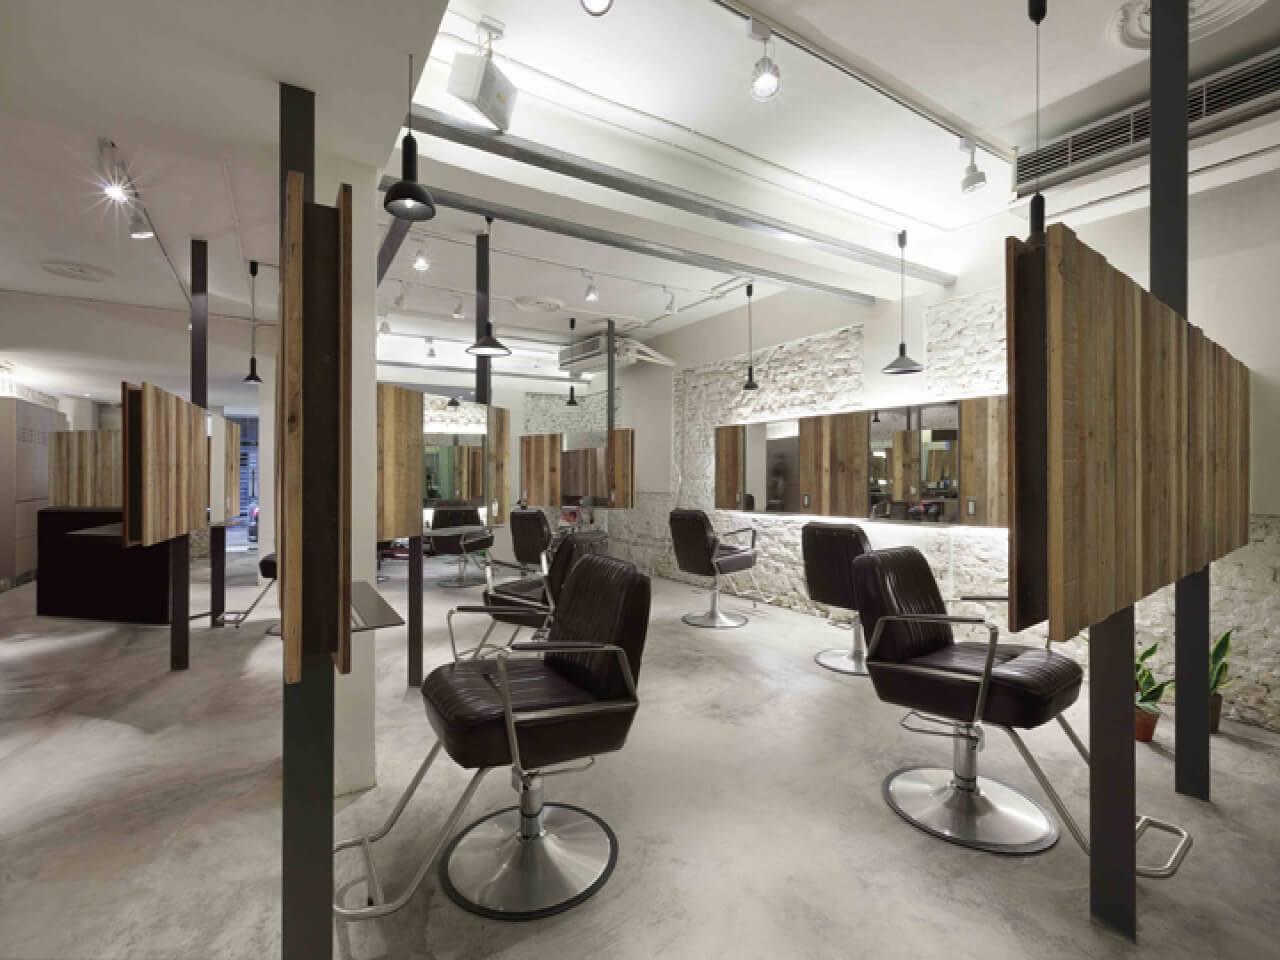 Salon Interior Decorating